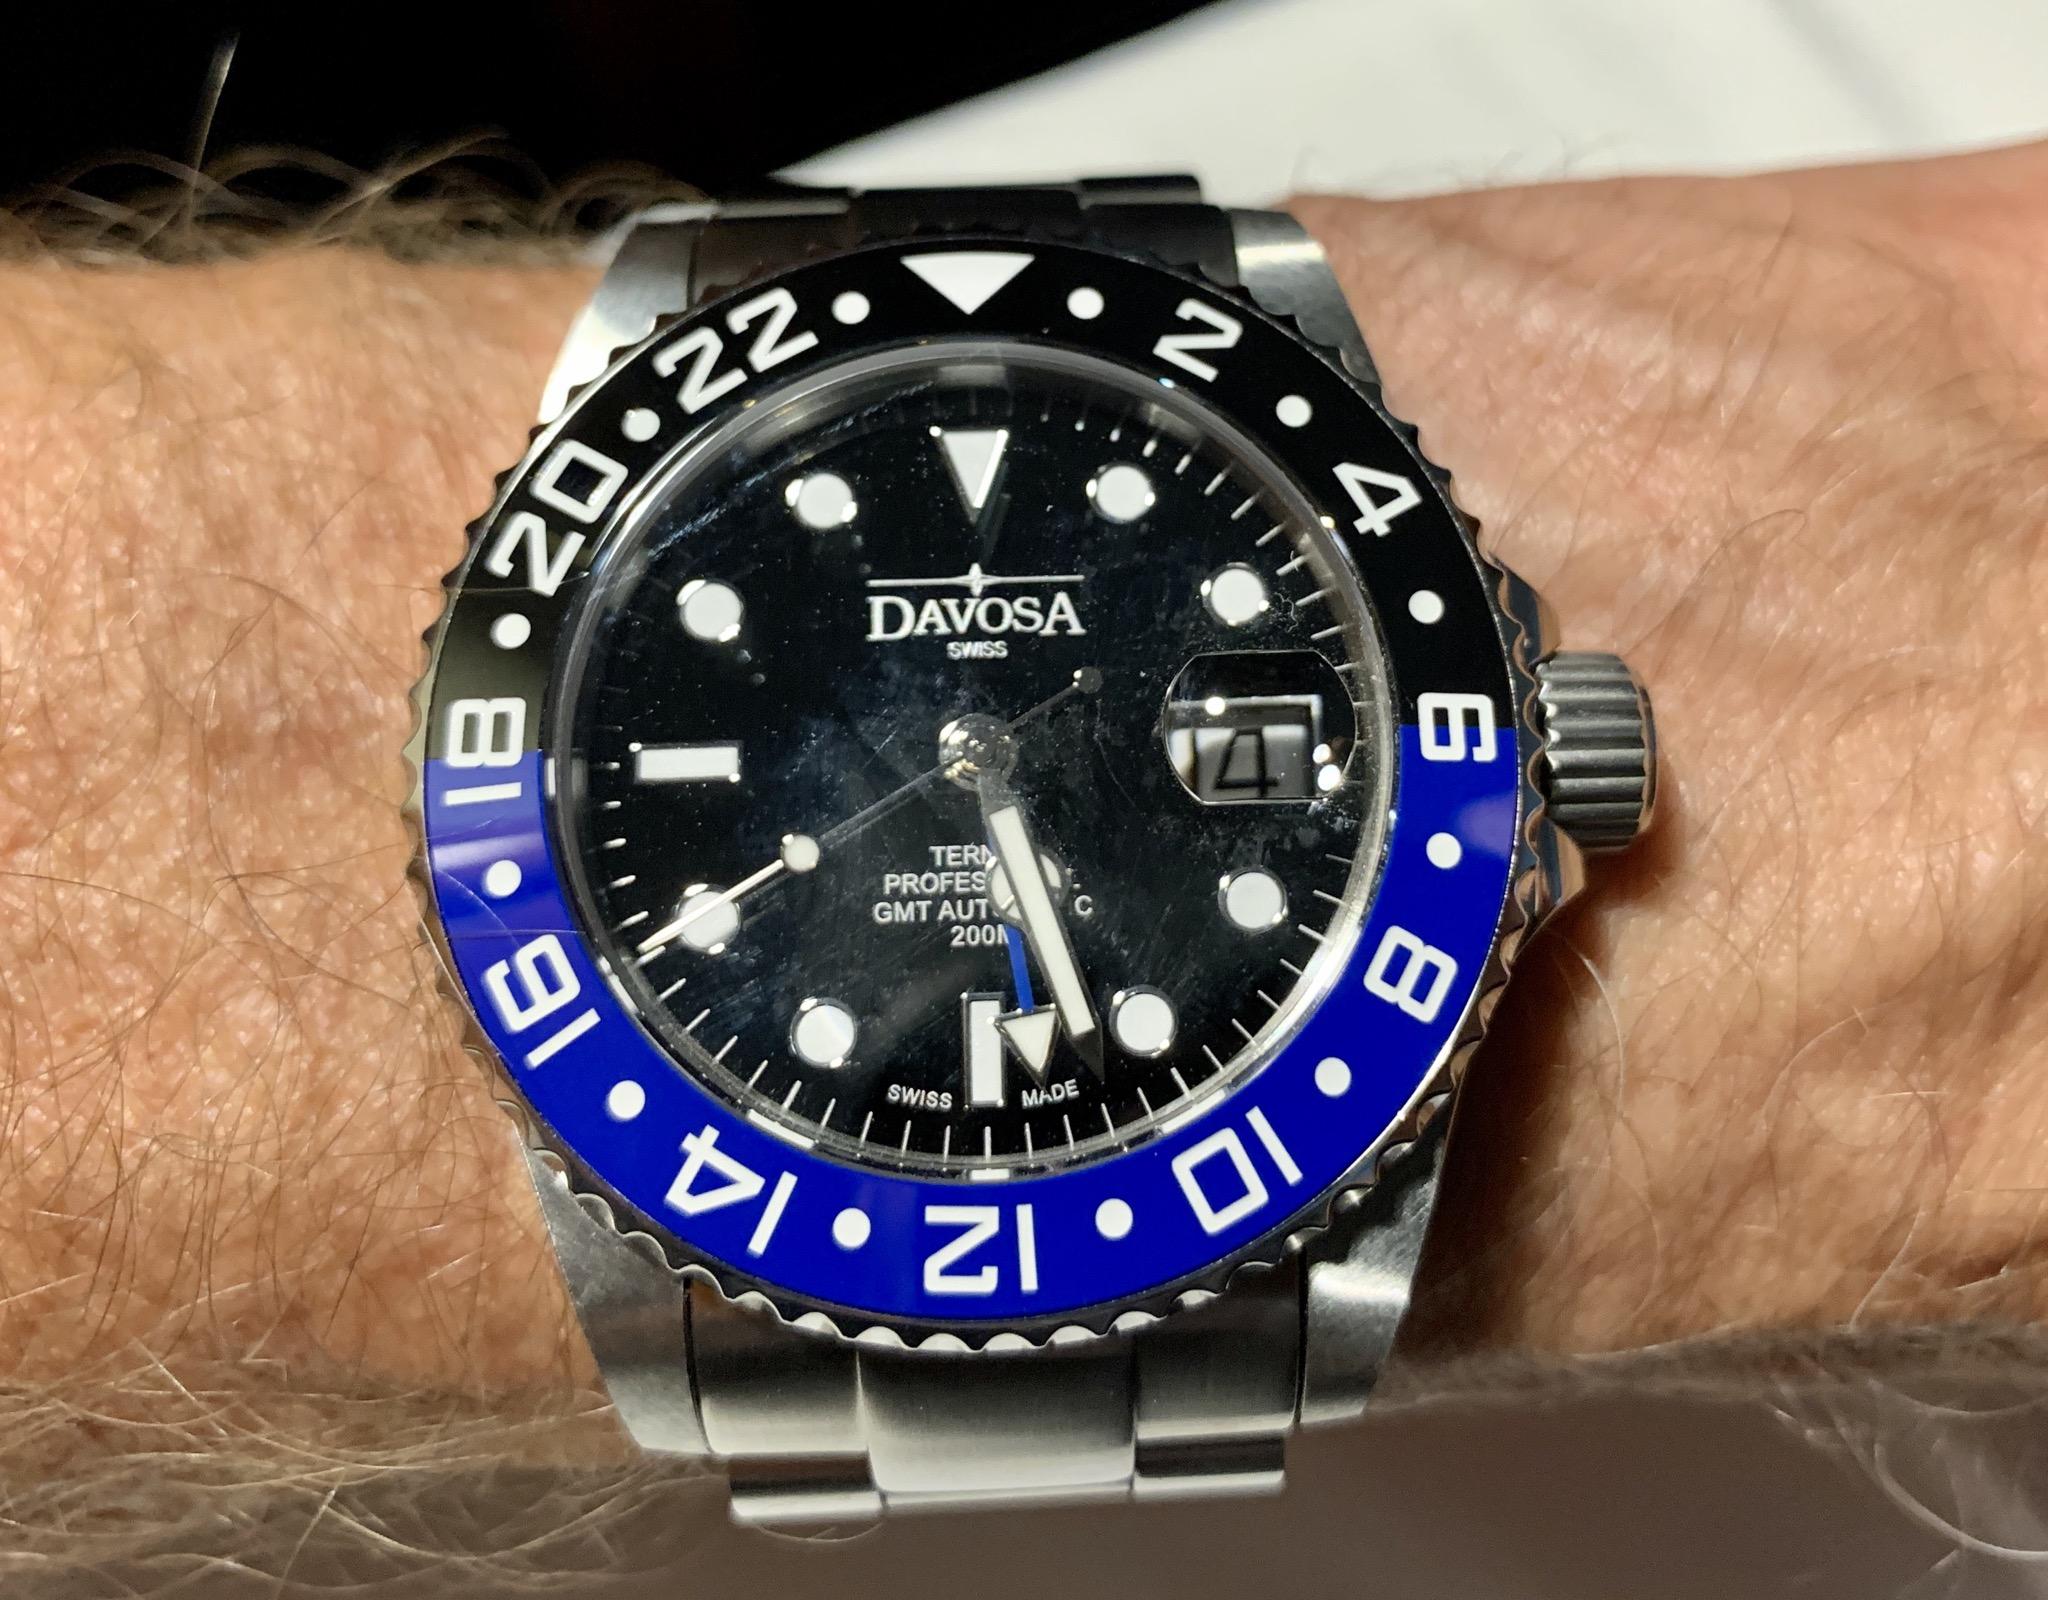 0C864BB0-E820-443D-BFA7-3FEBA70DAAF9.jpeg